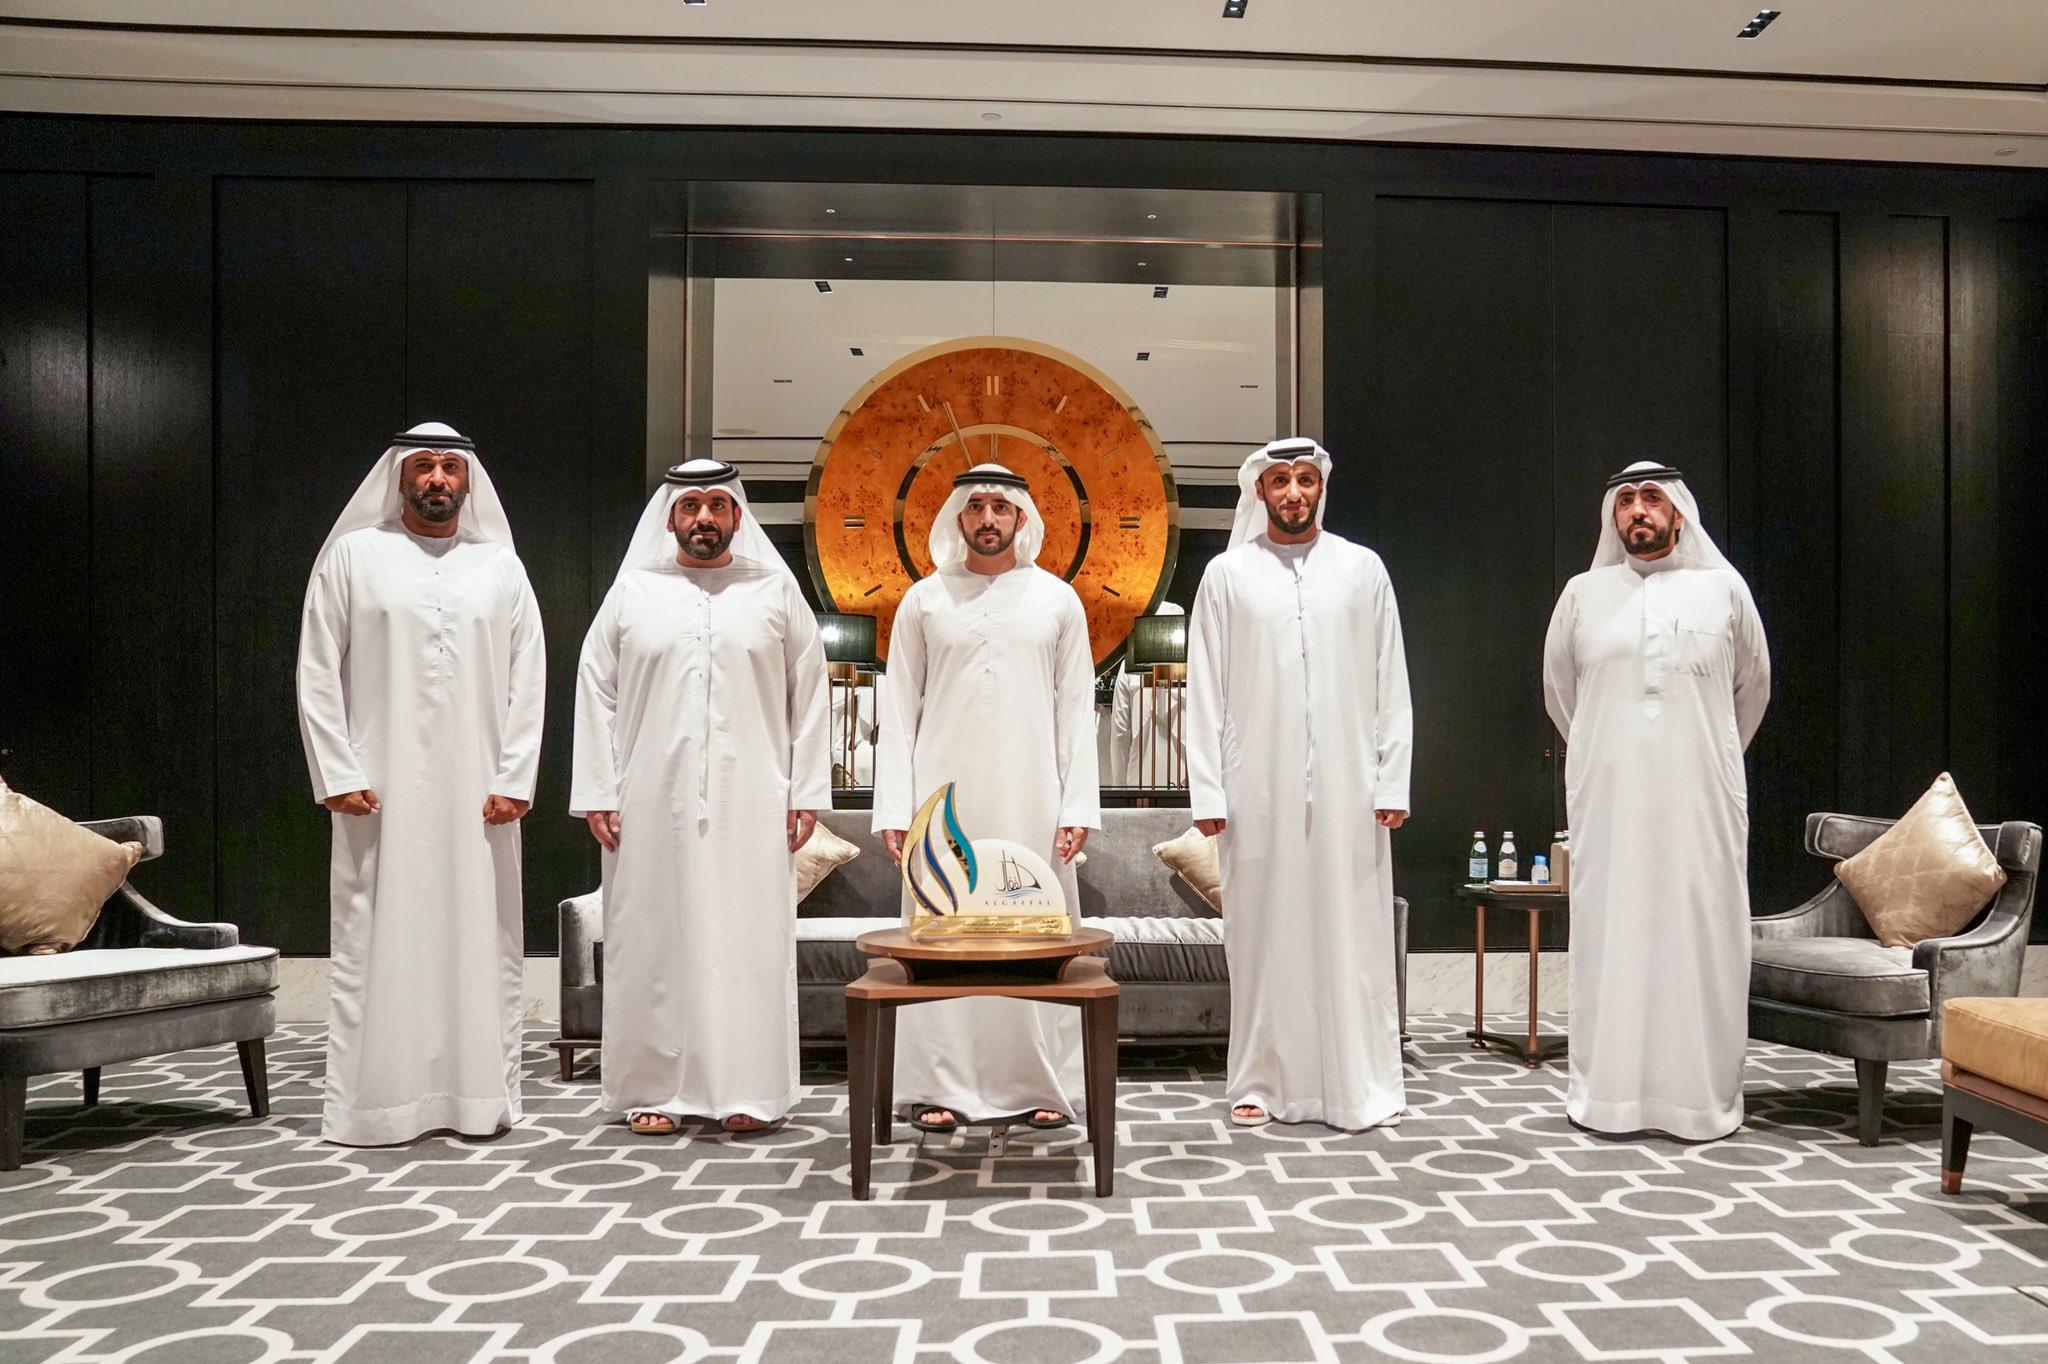 Hamdan bin Mohammed congratulates Board of Dubai International Marine Club on successful organisation of Al Gaffal traditional dhow race